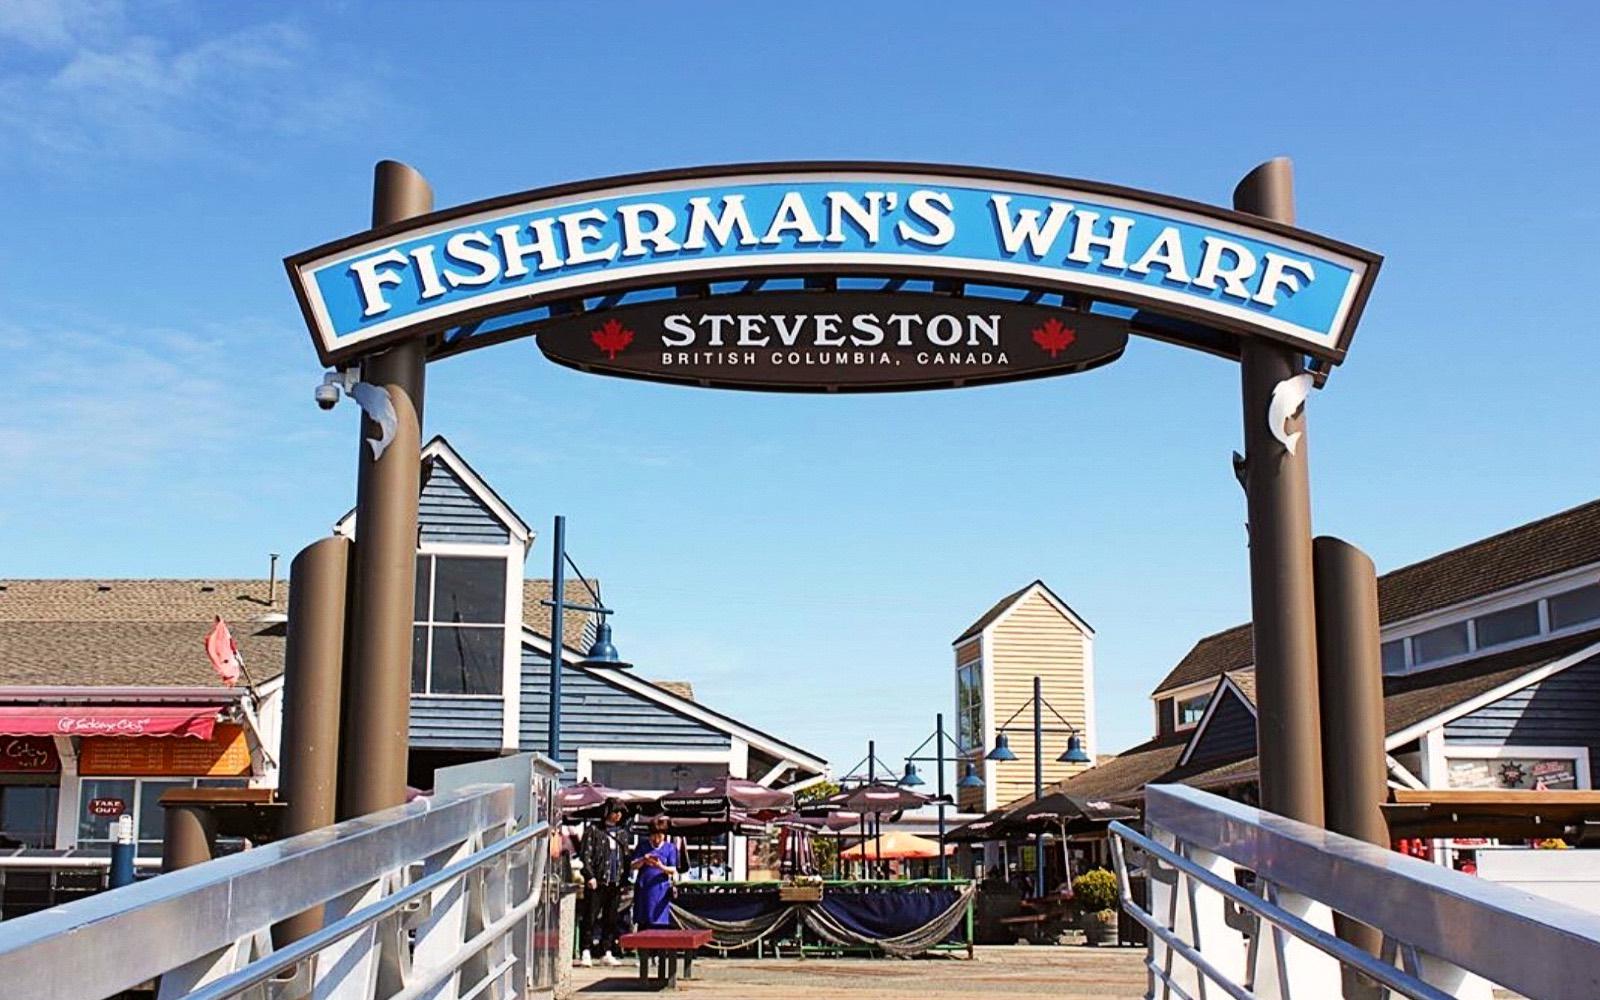 The entrance to Fisherman's Wharf, Steveston